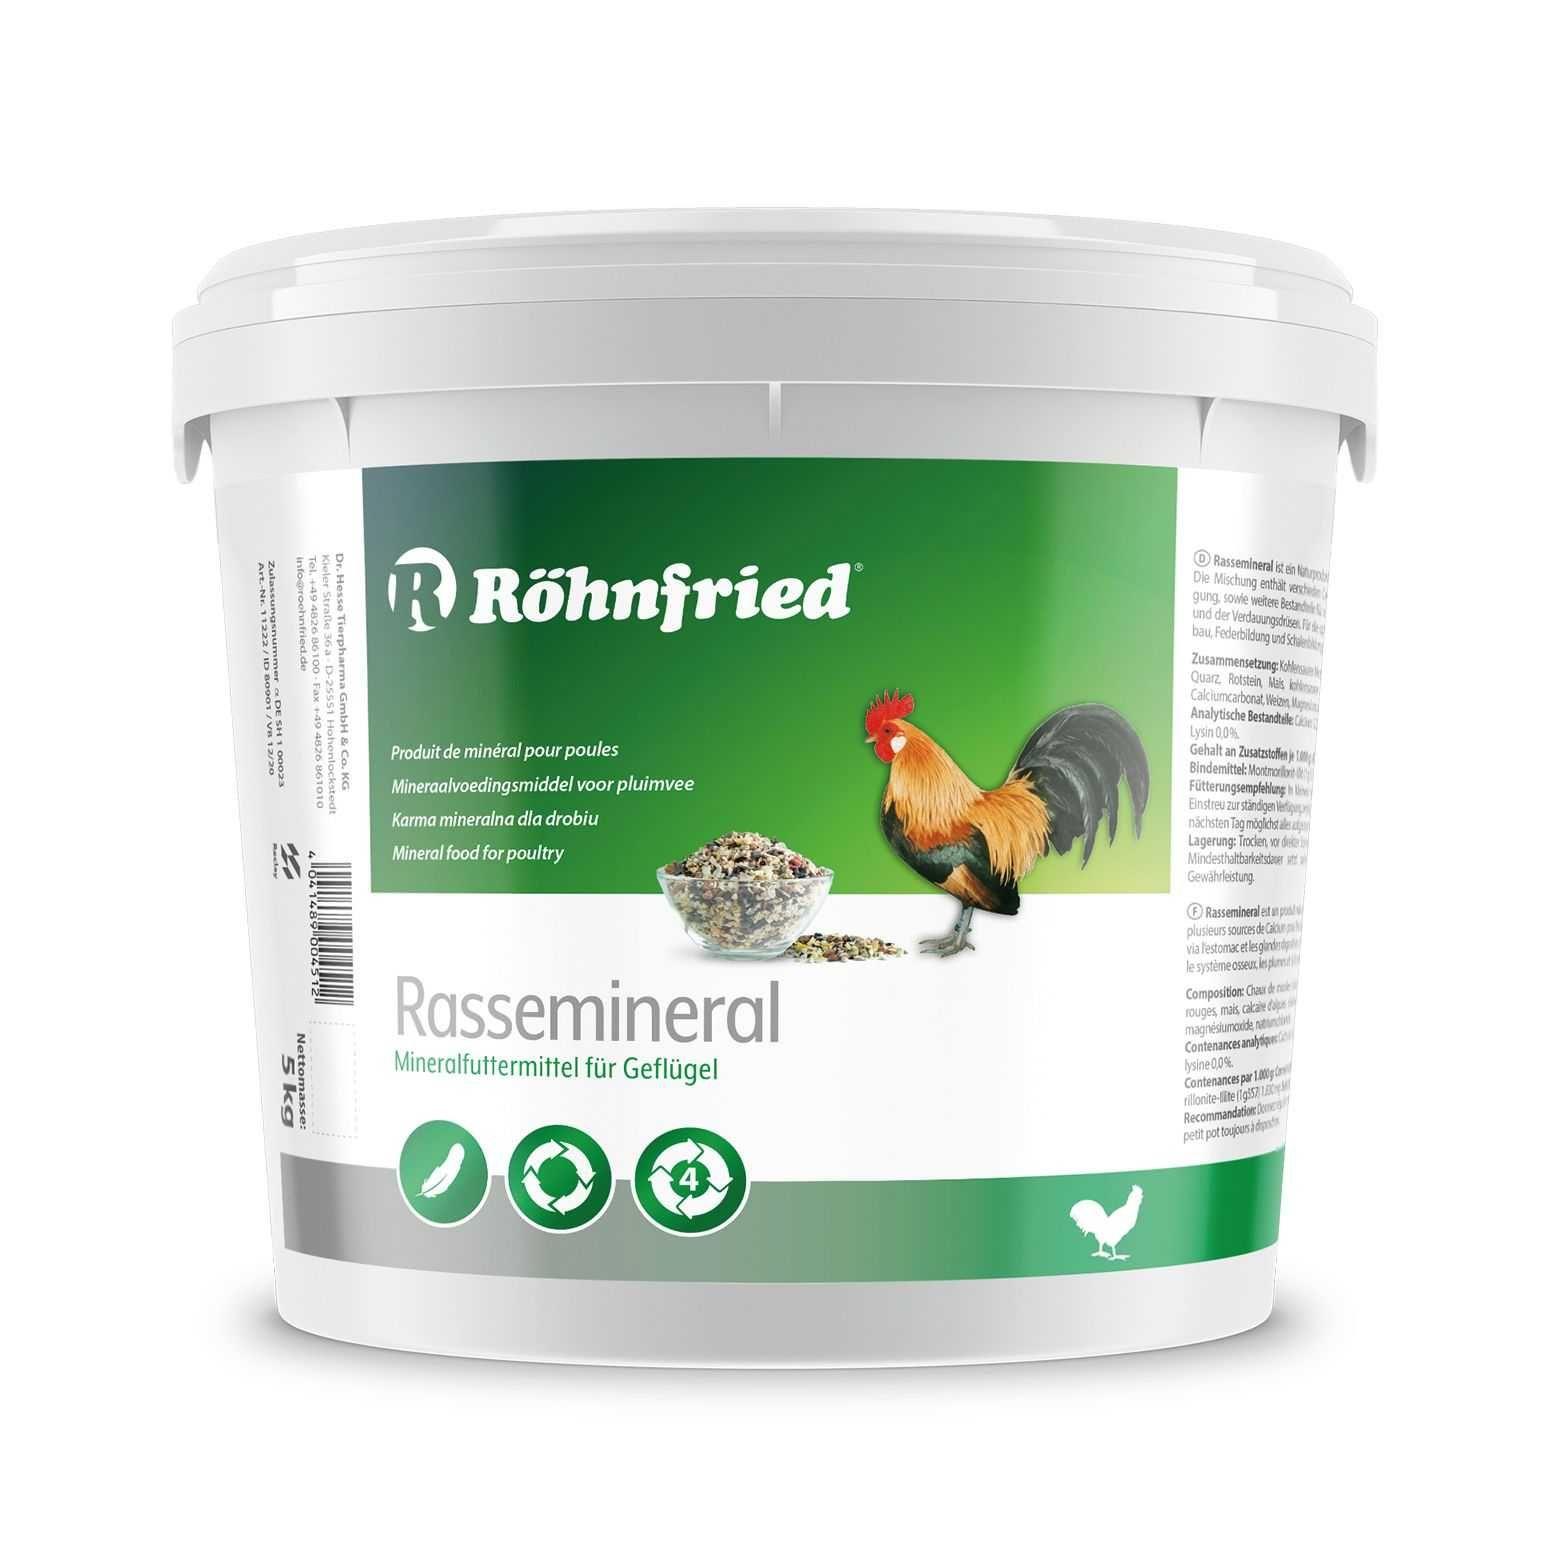 Röhnfried Rasse Mineral für Rassegeflügel 5 kg-drób hodowlany